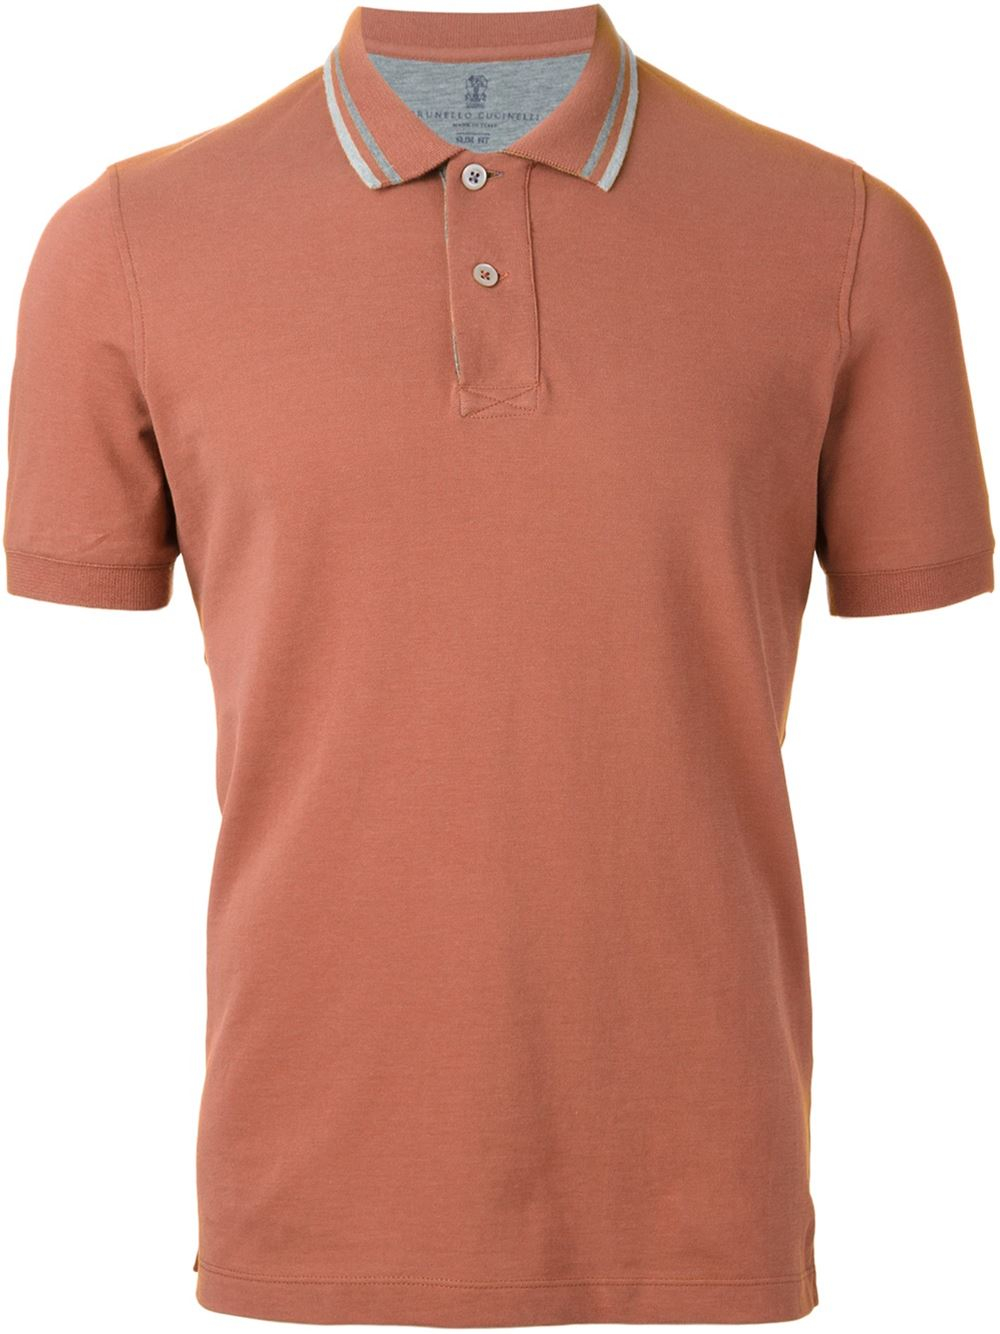 Brunello Cucinelli Striped Collar Polo Shirt In Brown For